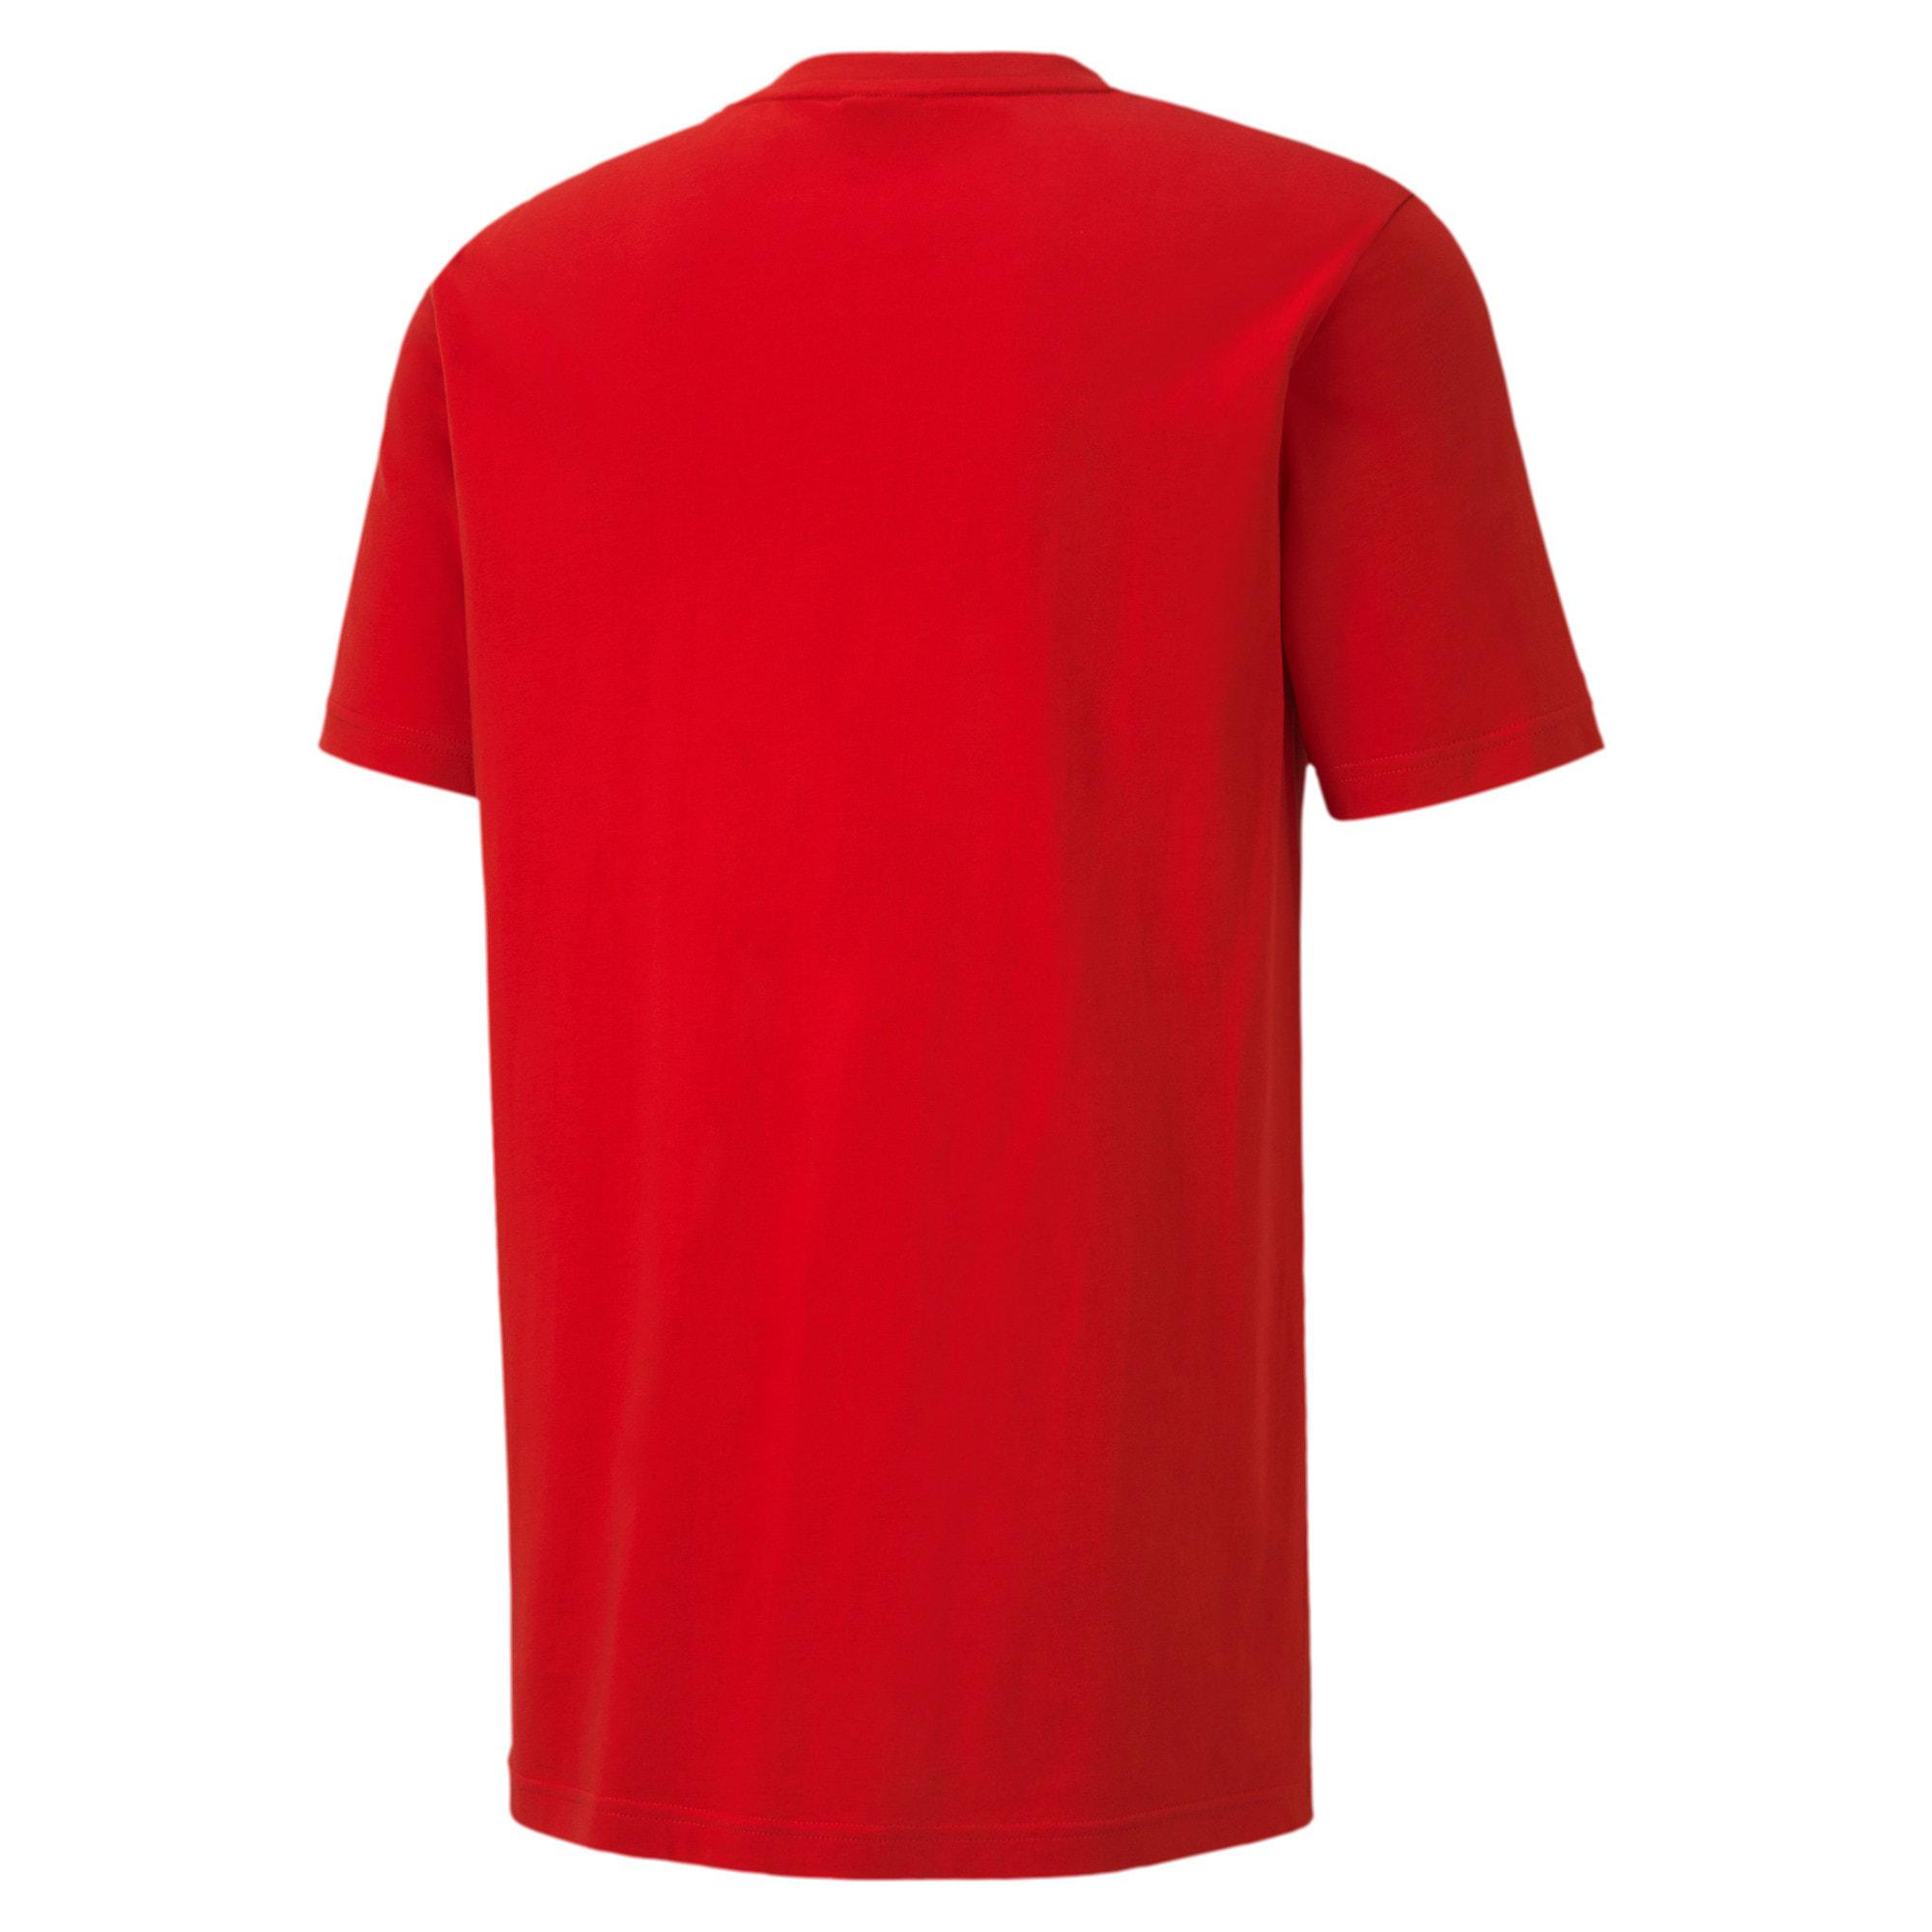 Thumbnail 6 of CLASSICS ロゴ SS Tシャツ 半袖, High Risk Red, medium-JPN